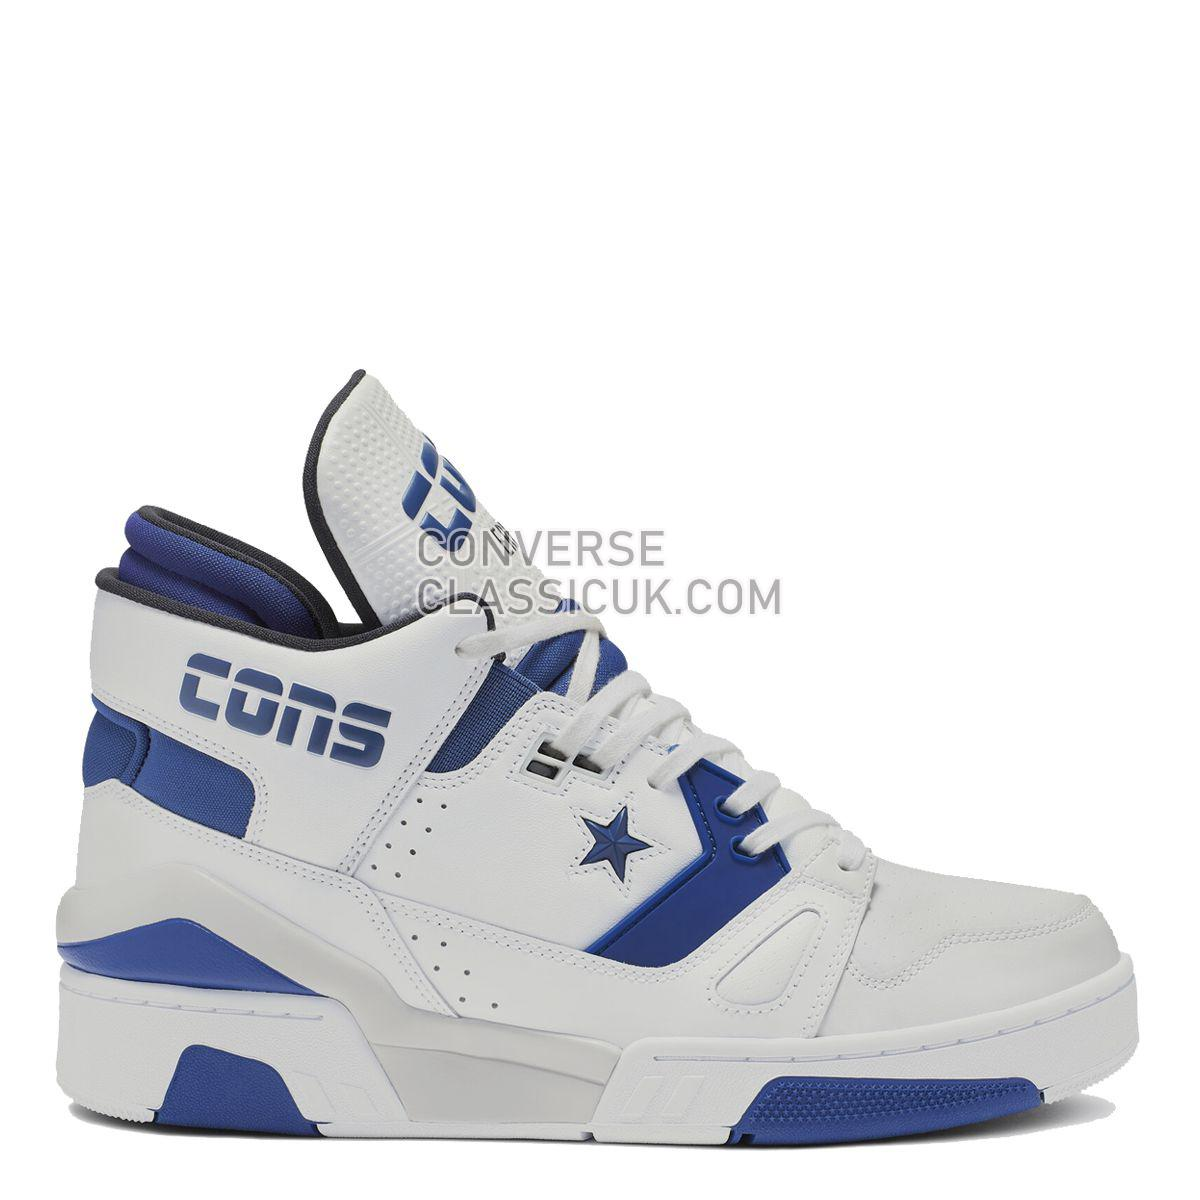 Converse ERX 260 Mid Lake Blue Edition Mens 163851 White/Royal Shoes